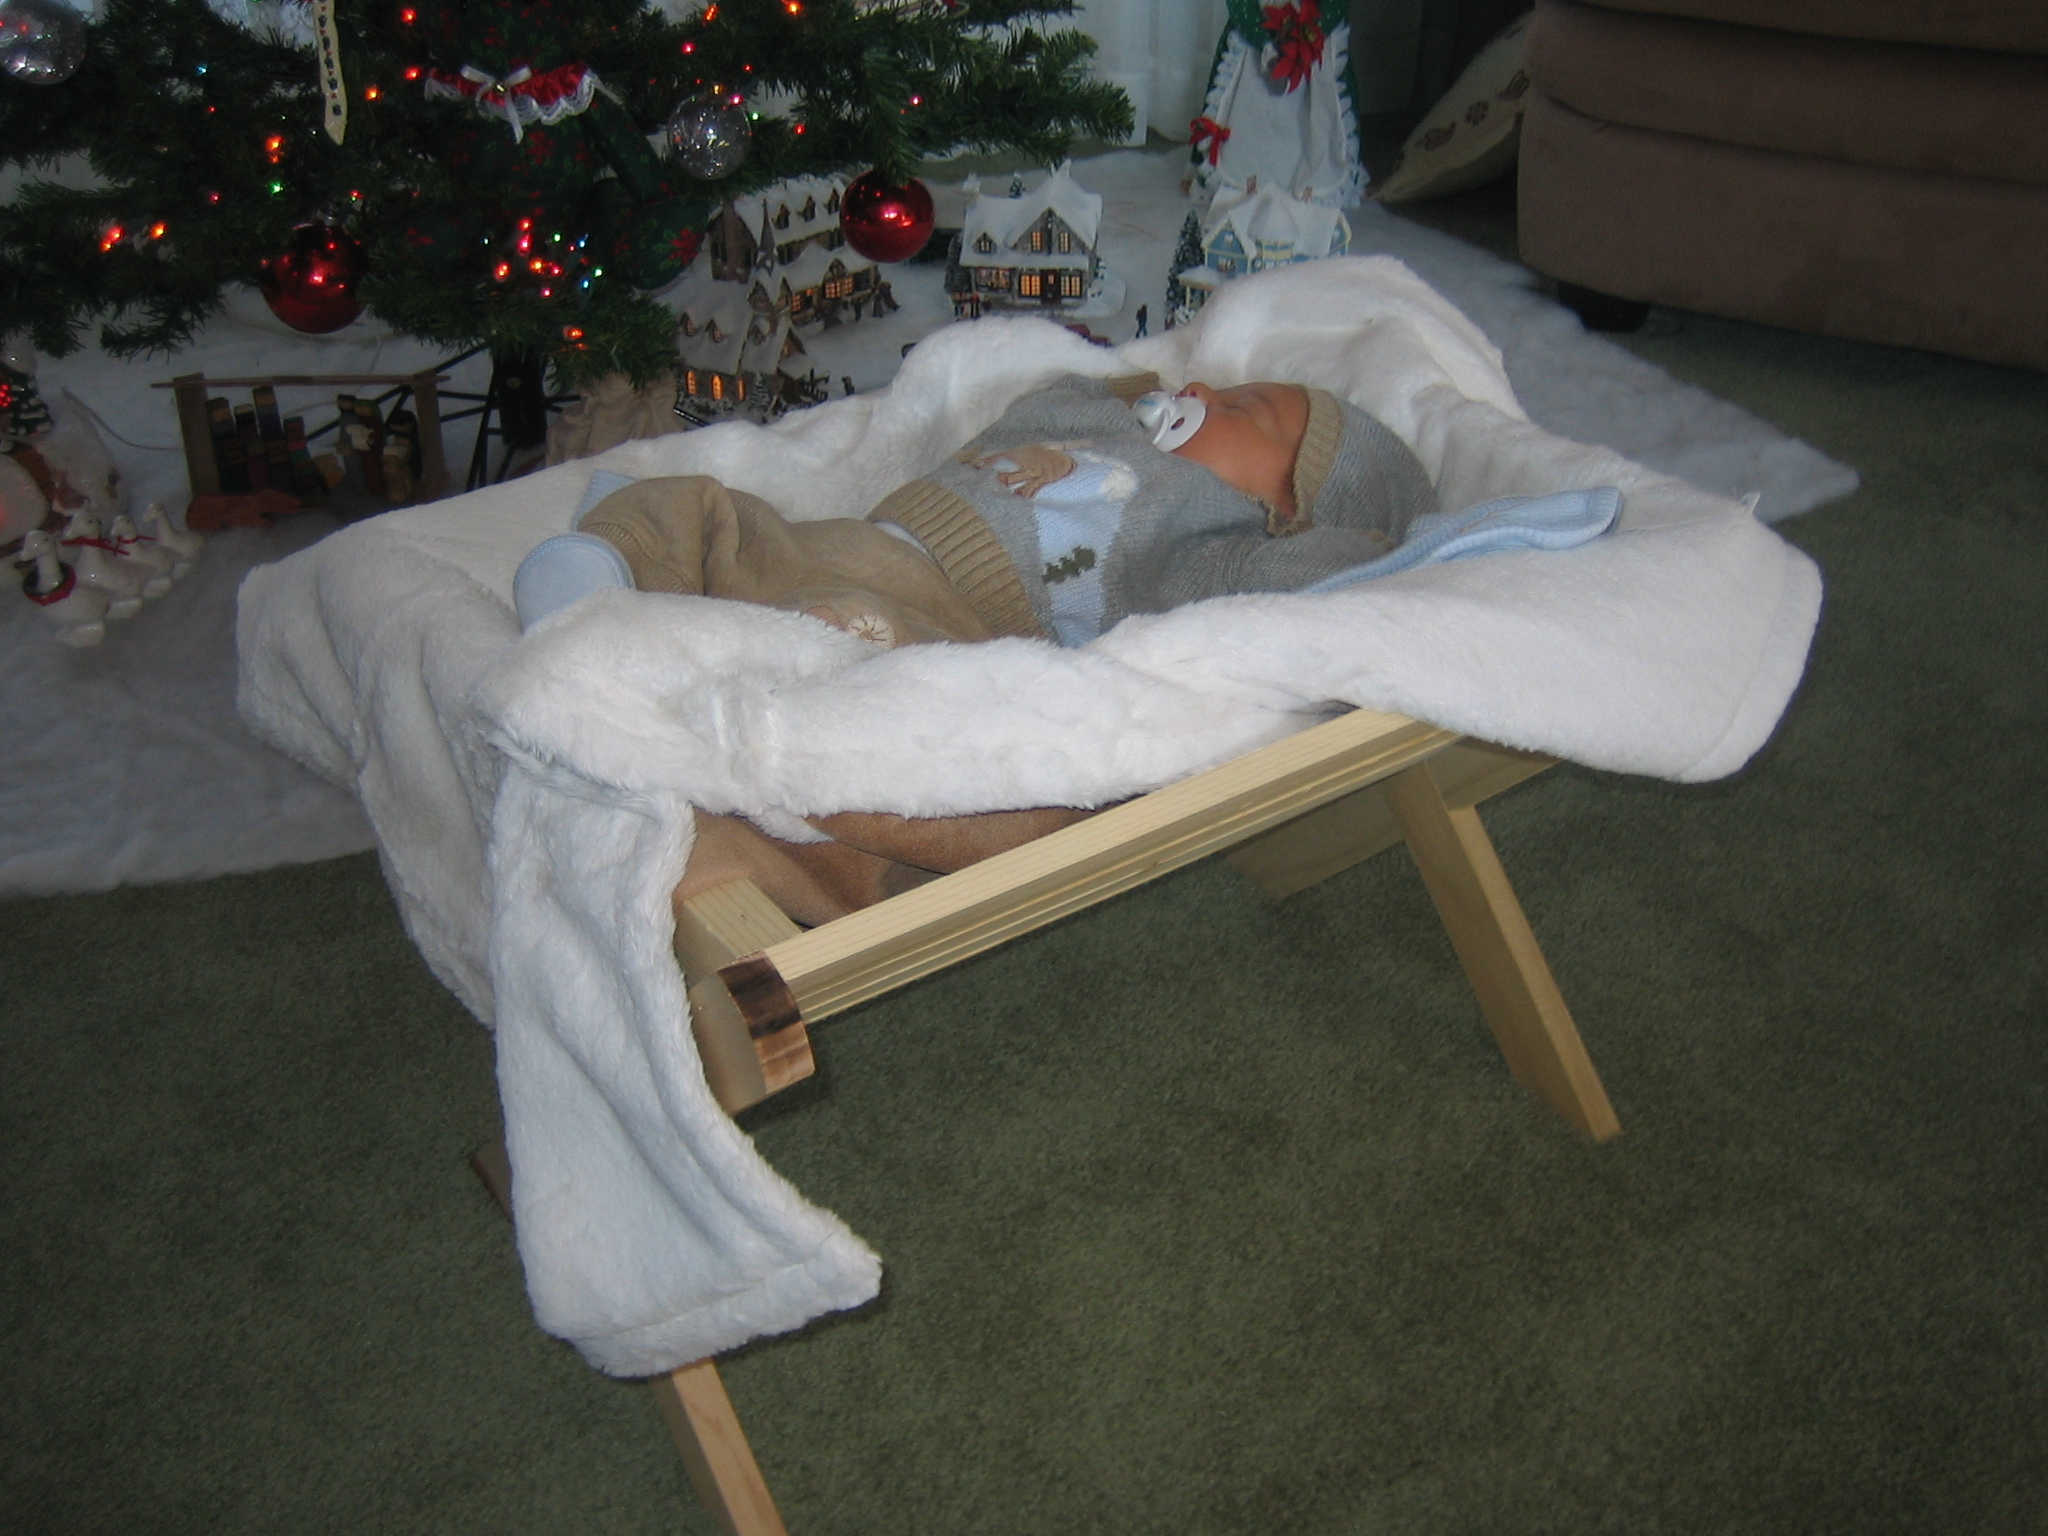 december-12-20-2007-015.jpg